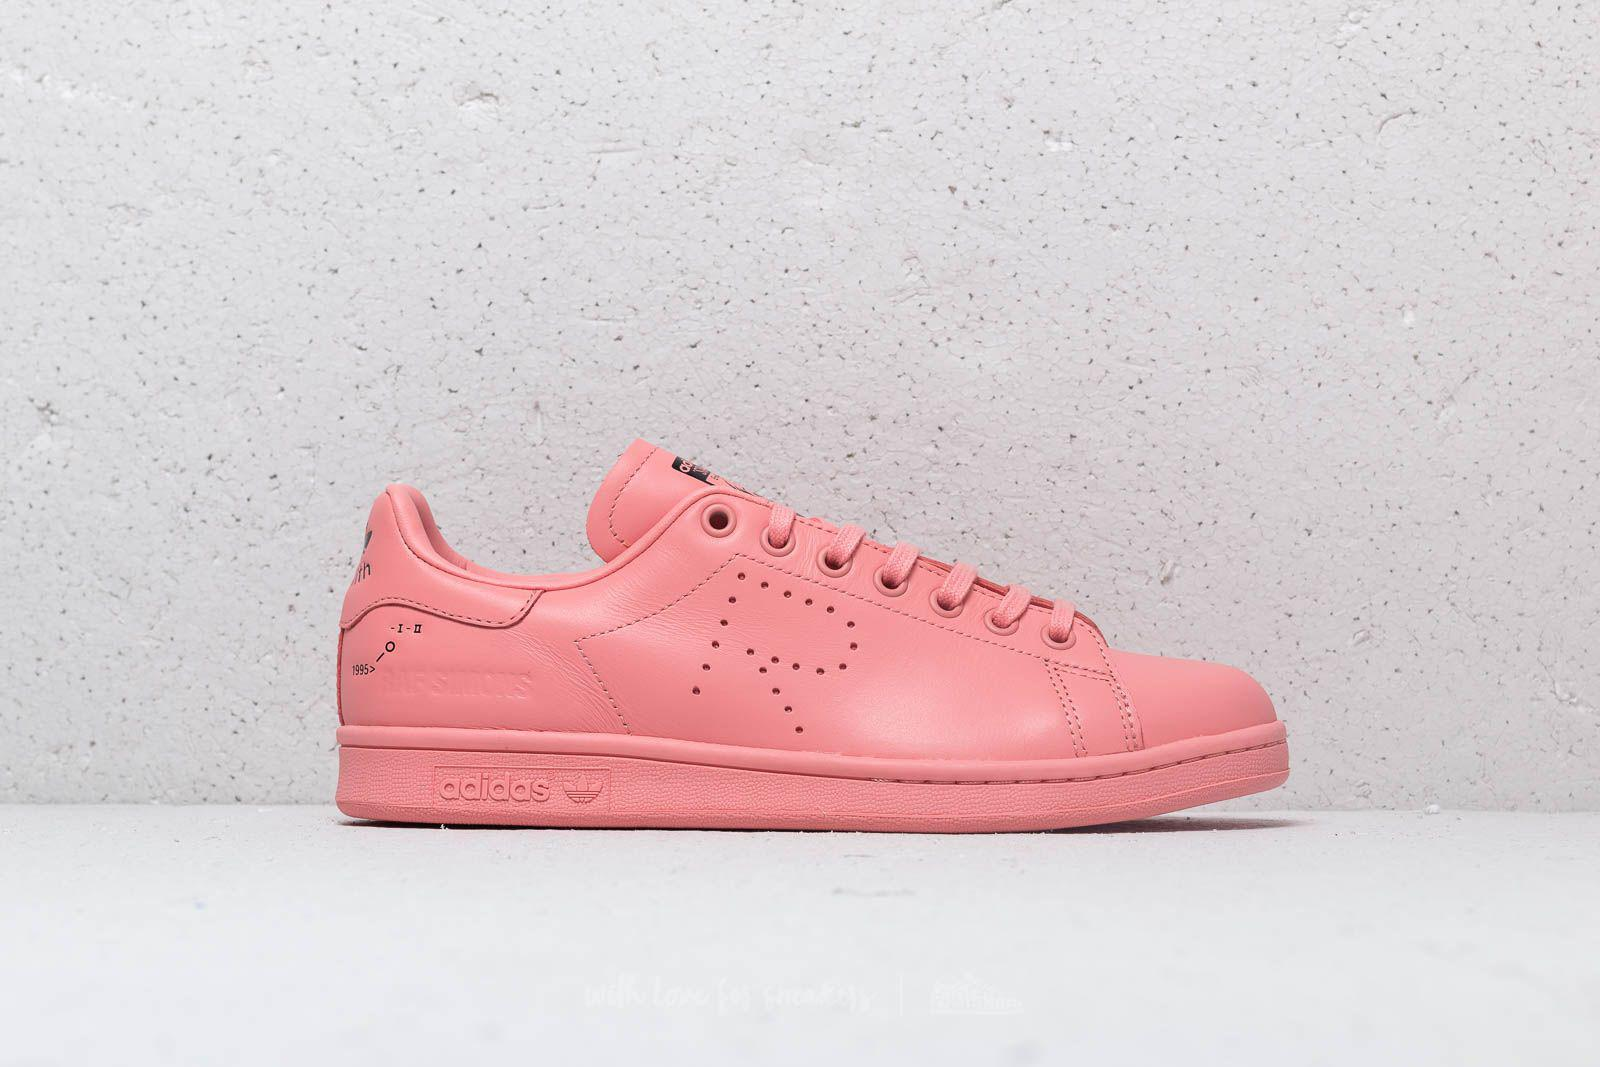 adidas x raf simons rose